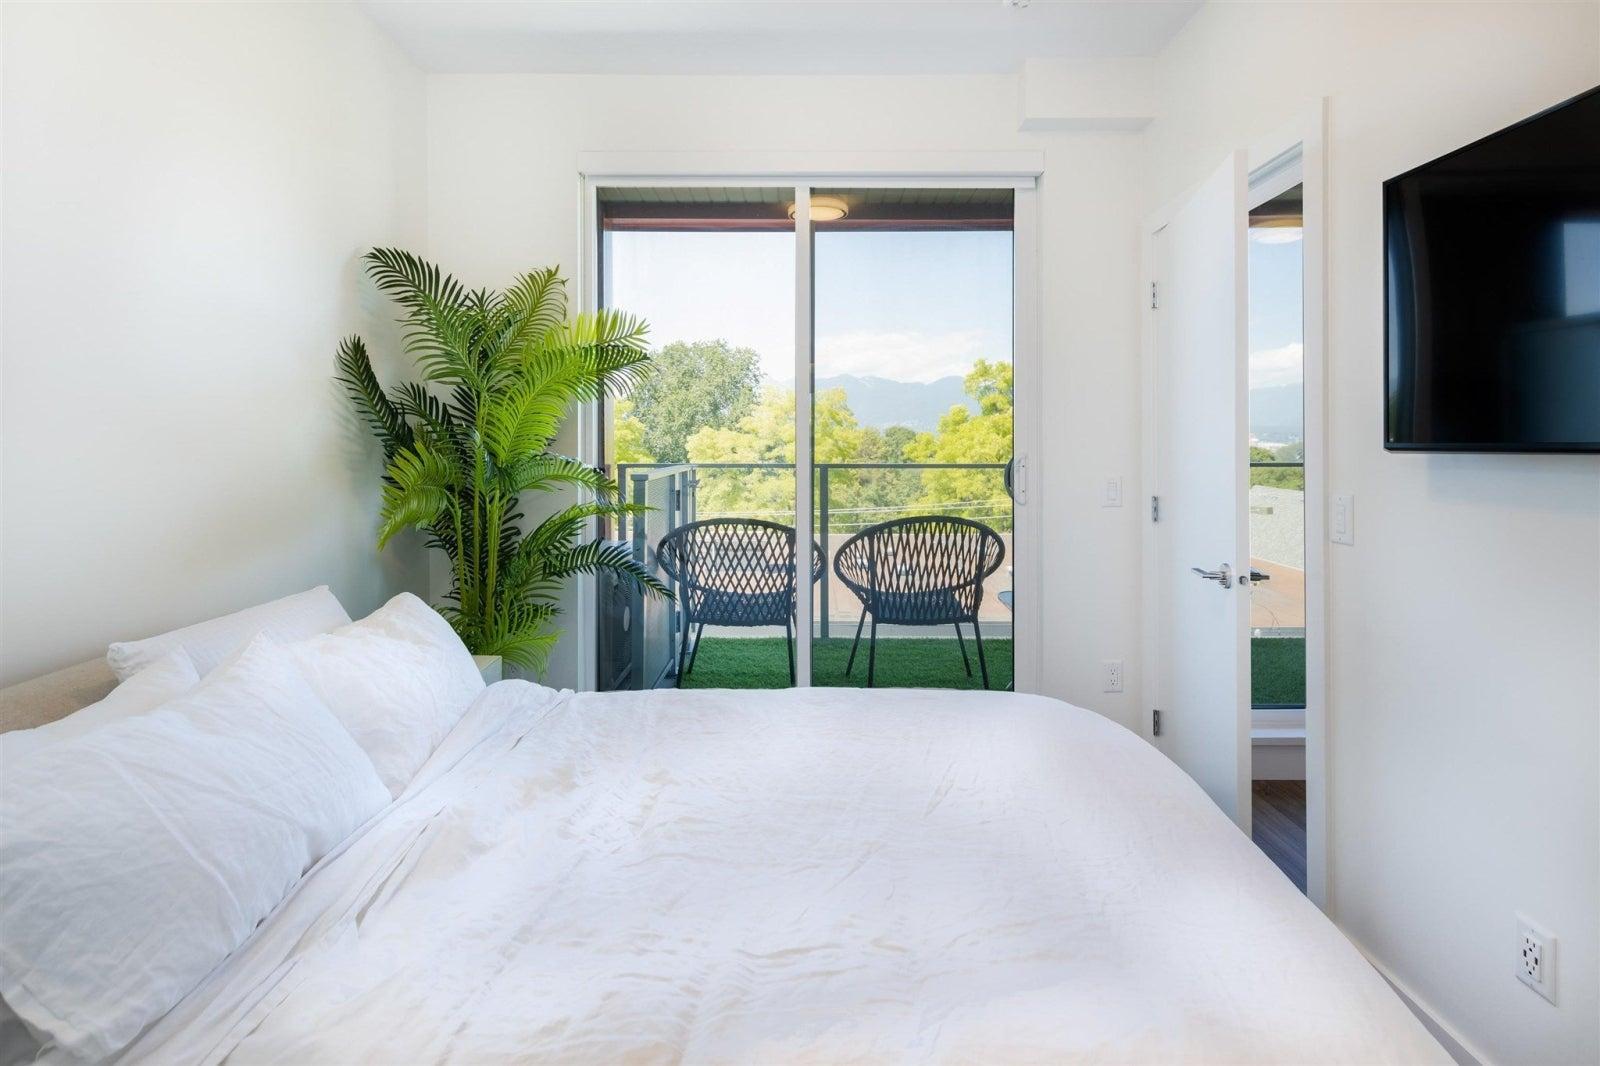 408 379 E BROADWAY AVENUE - Mount Pleasant VE Apartment/Condo for sale, 2 Bedrooms (R2599900) #14